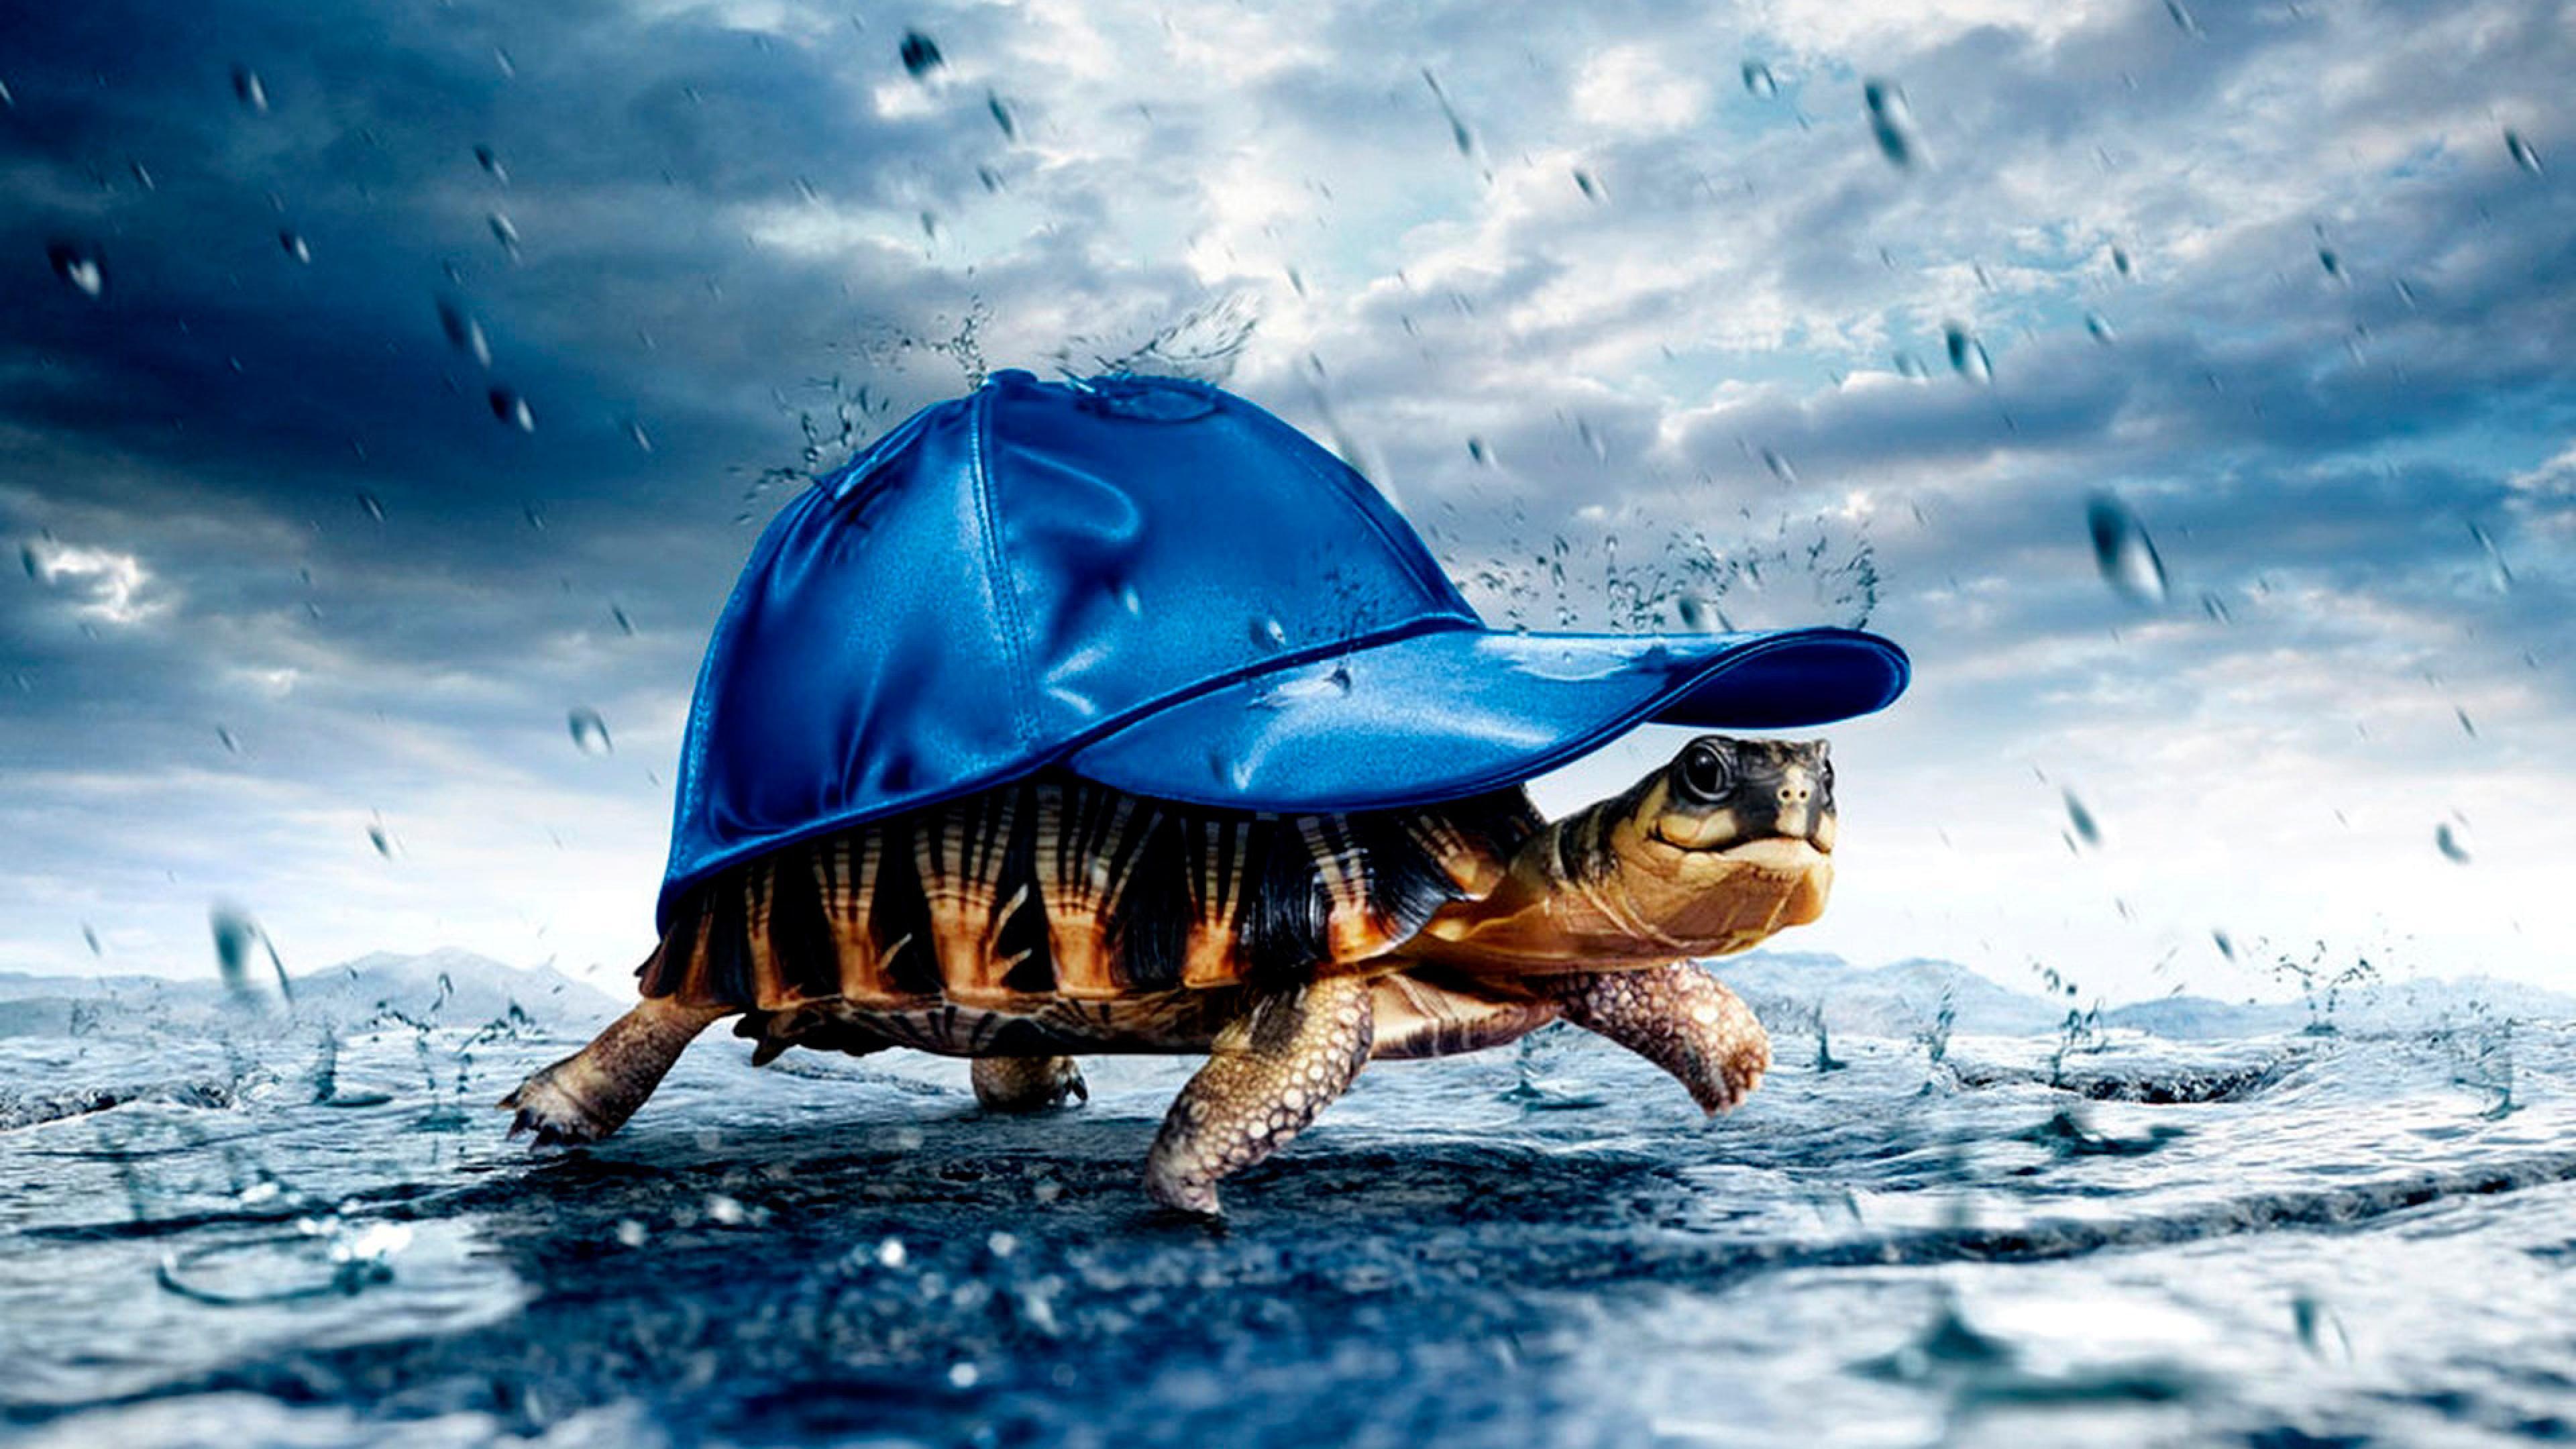 Image: Turtle, shell, cap, rain, drop, cover, goes